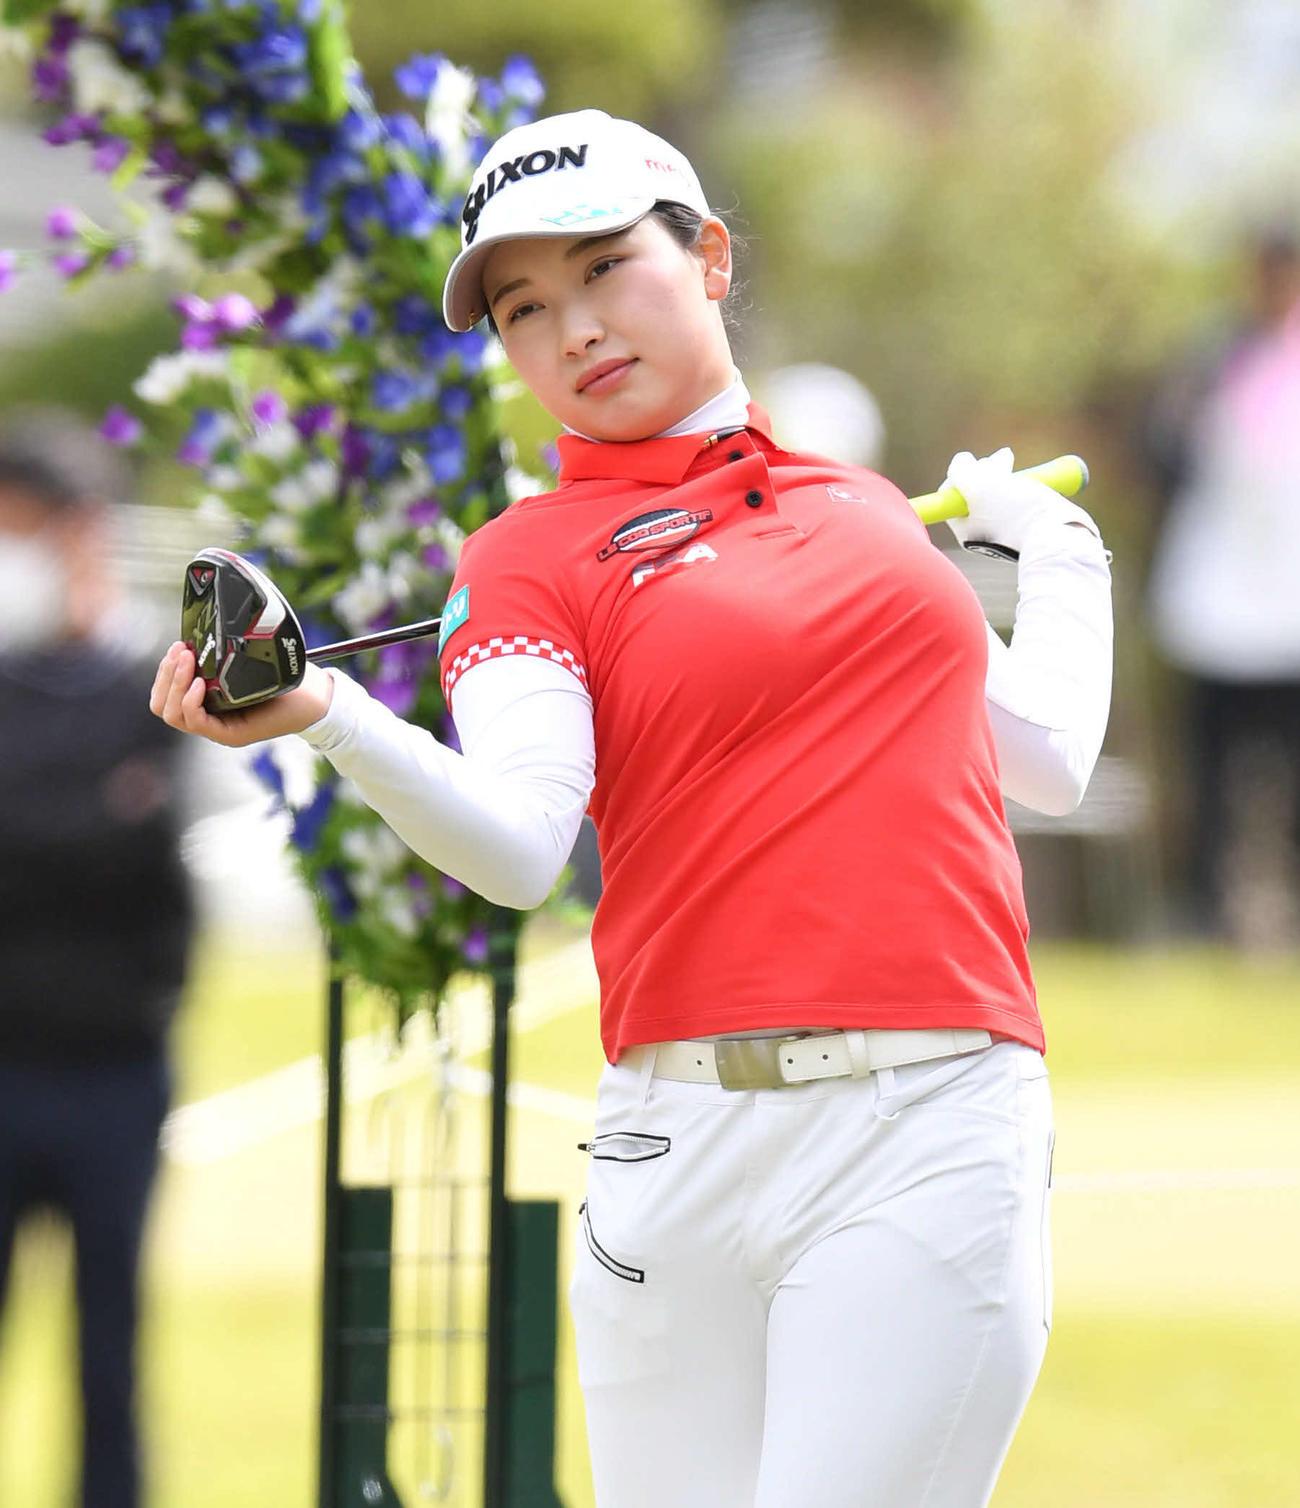 https://www.nikkansports.com/sports/golf/news/img/202104180000122-w1300_12.jpg